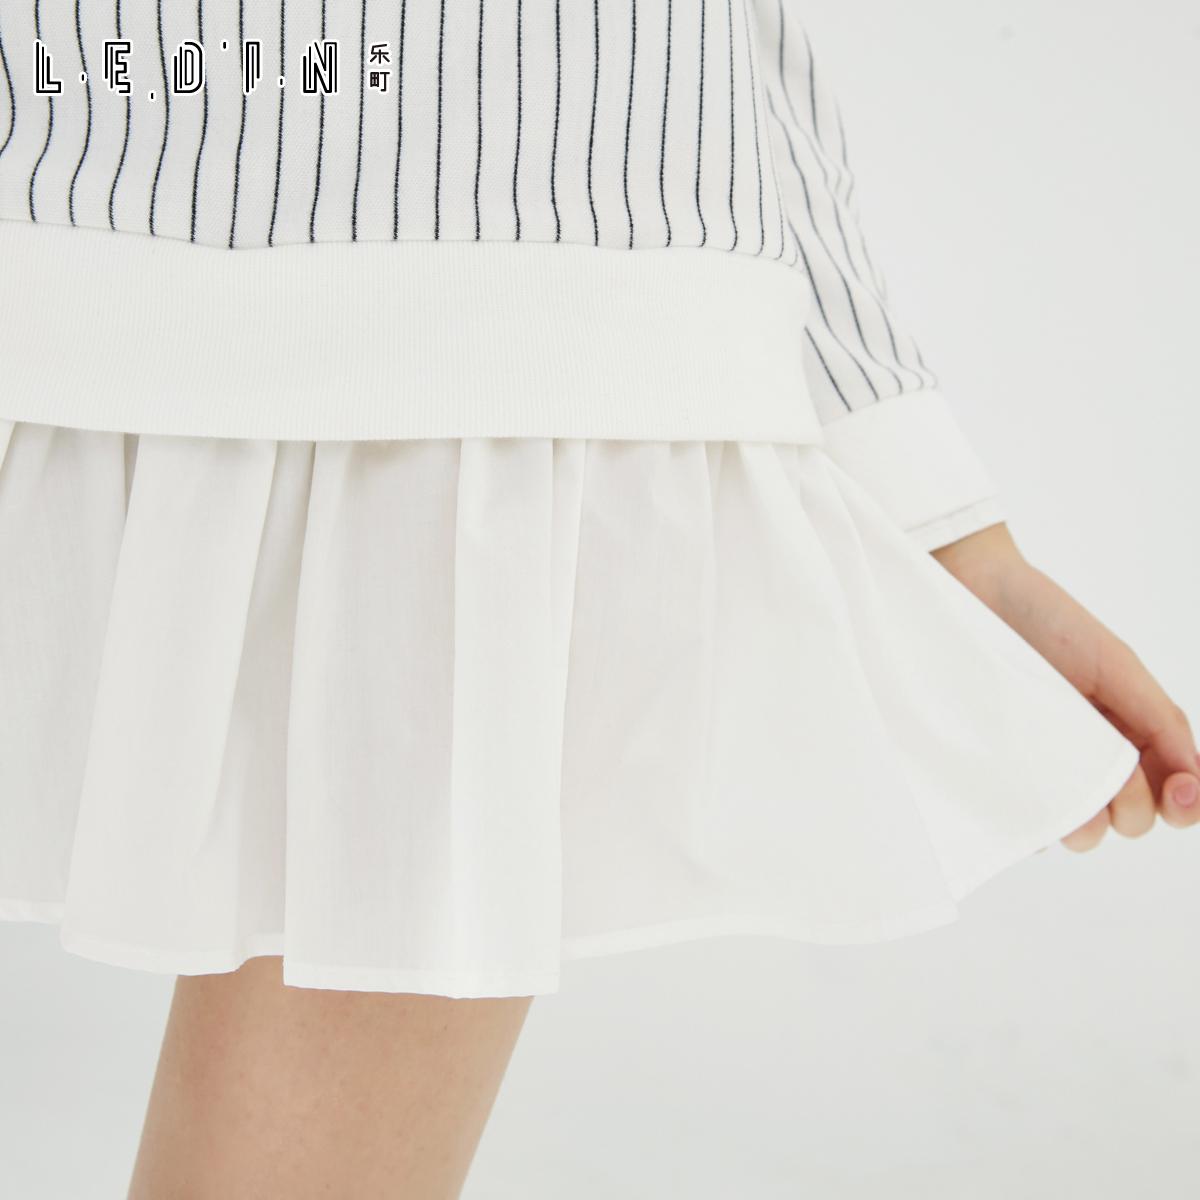 LE'TEEN 乐町 C1FA61218 女士连衣裙